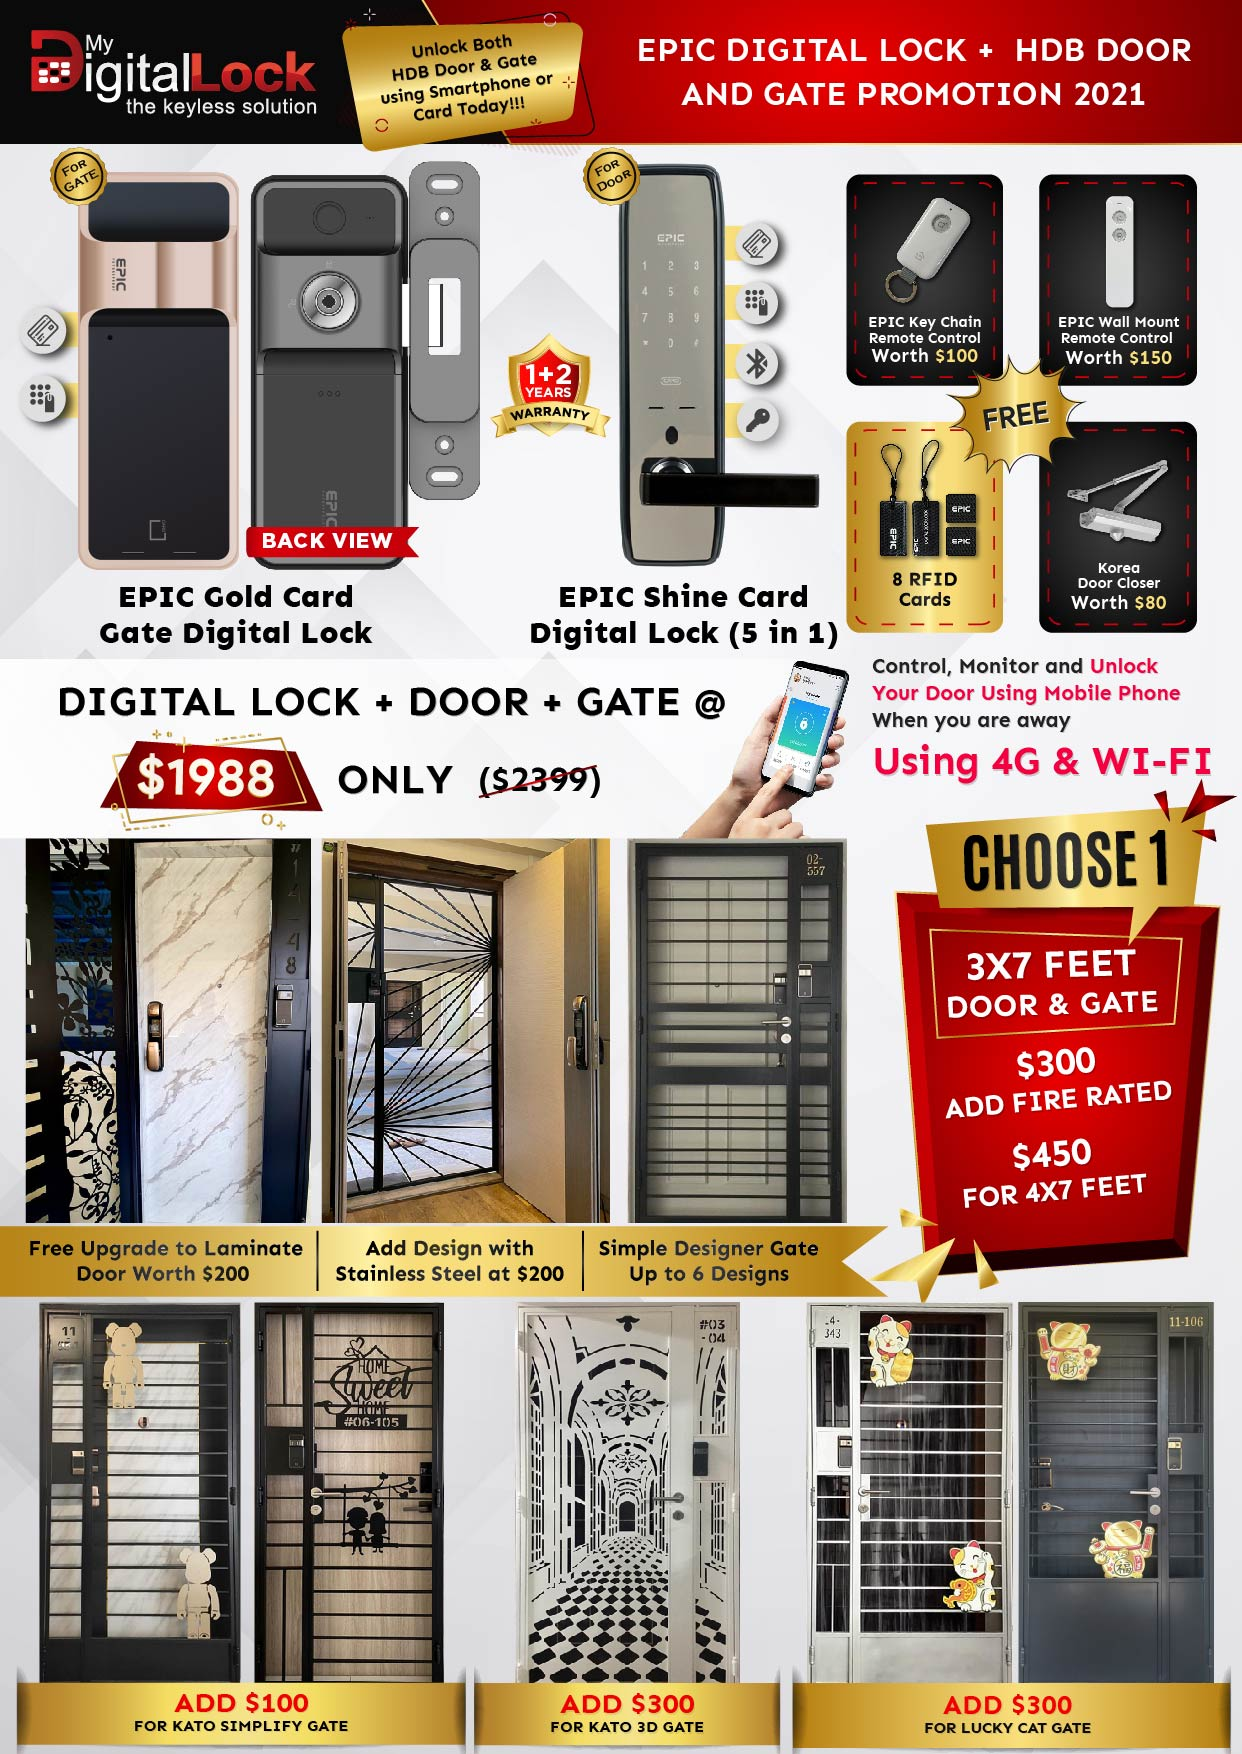 Epic Digital Lock and HDB Gate